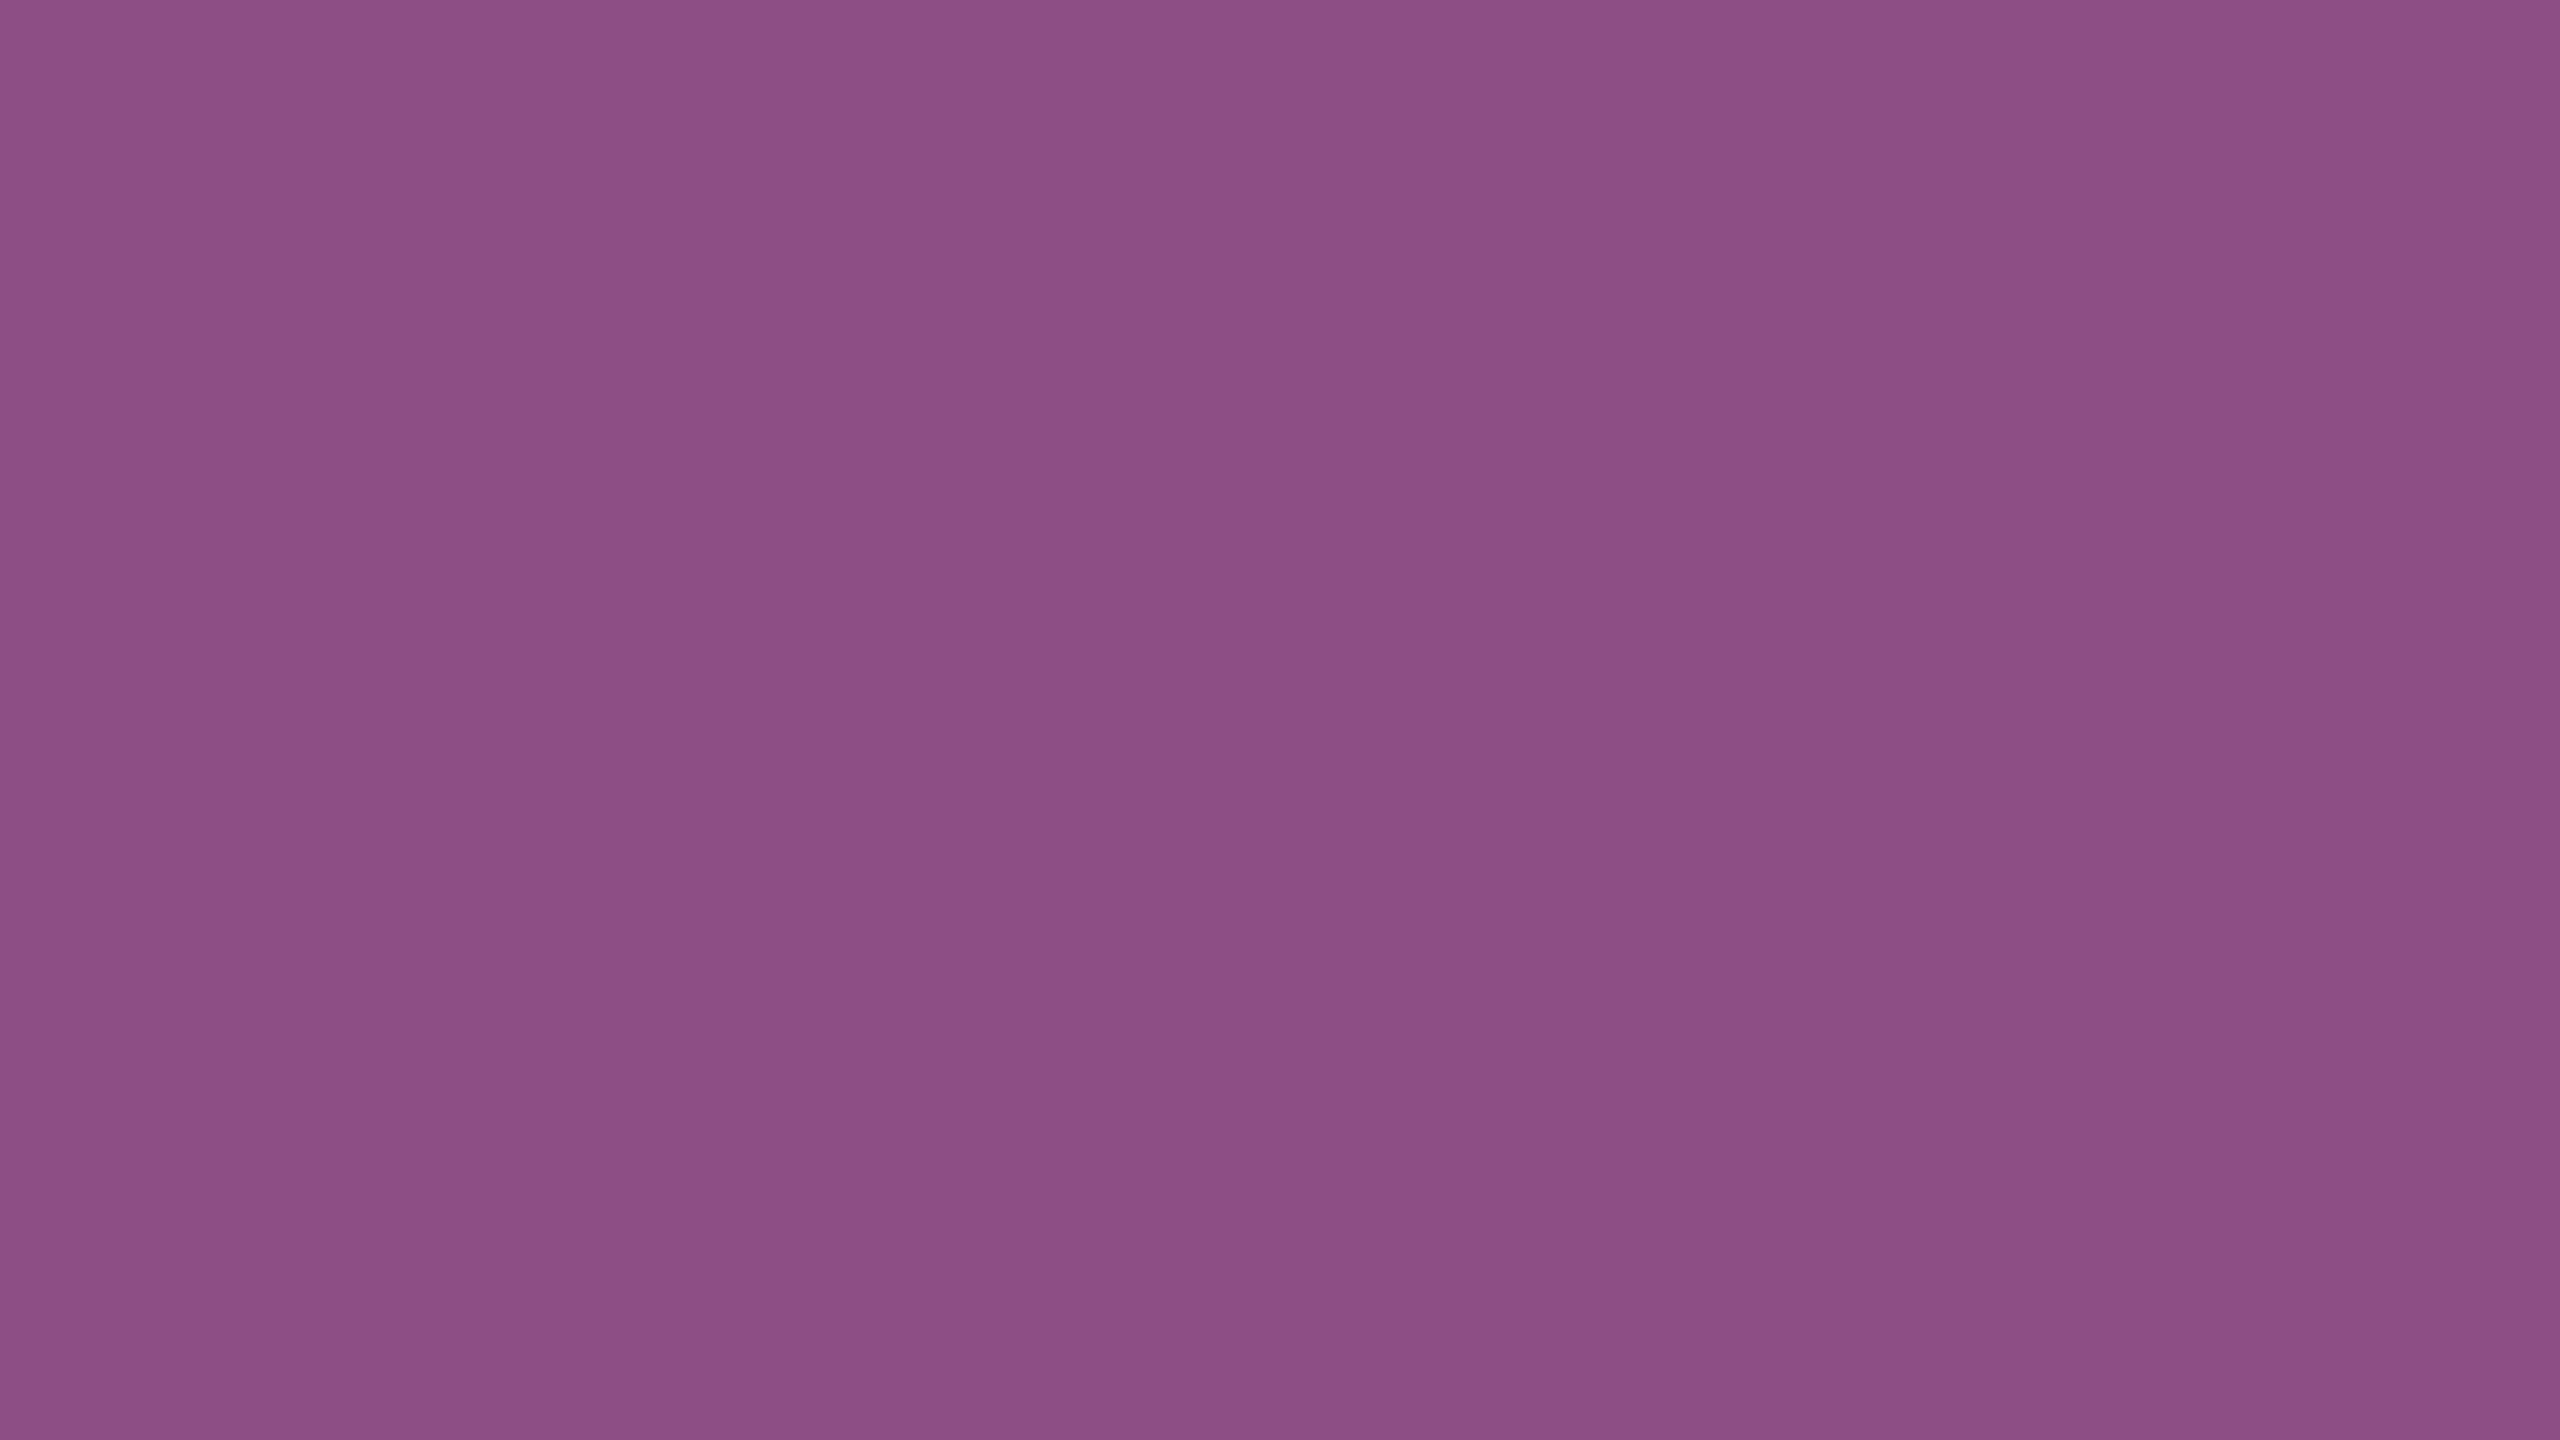 2560x1440 Razzmic Berry Solid Color Background